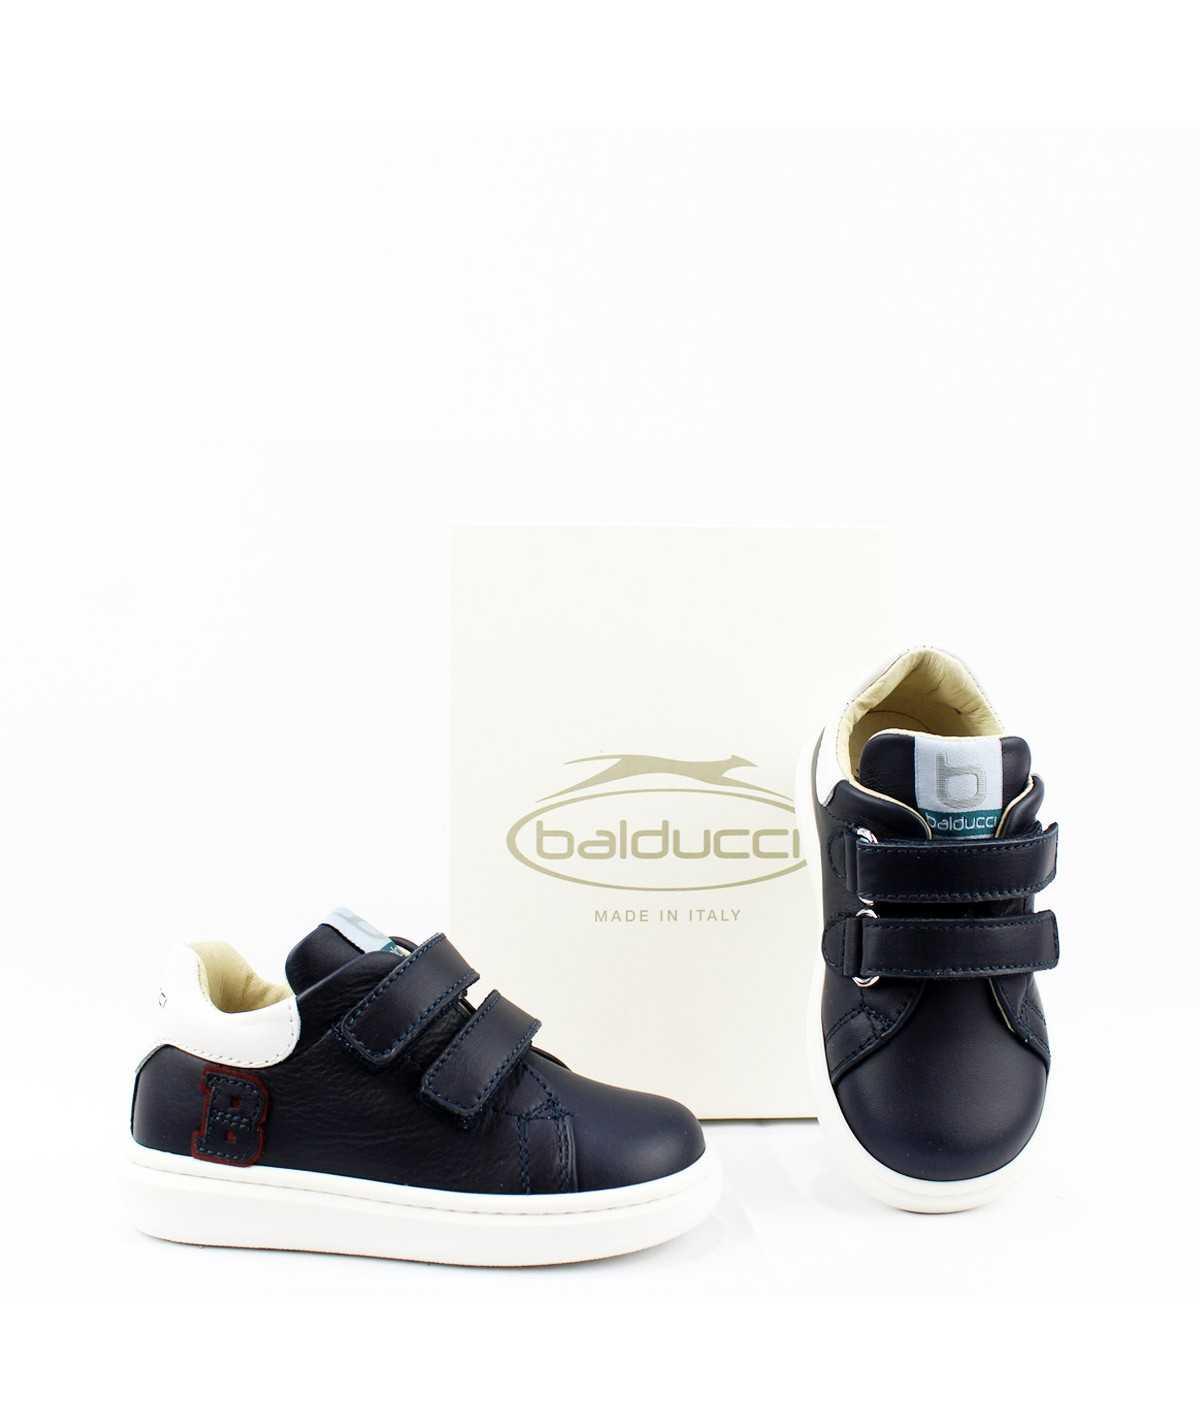 BALDUCCI Sneakers 19/24